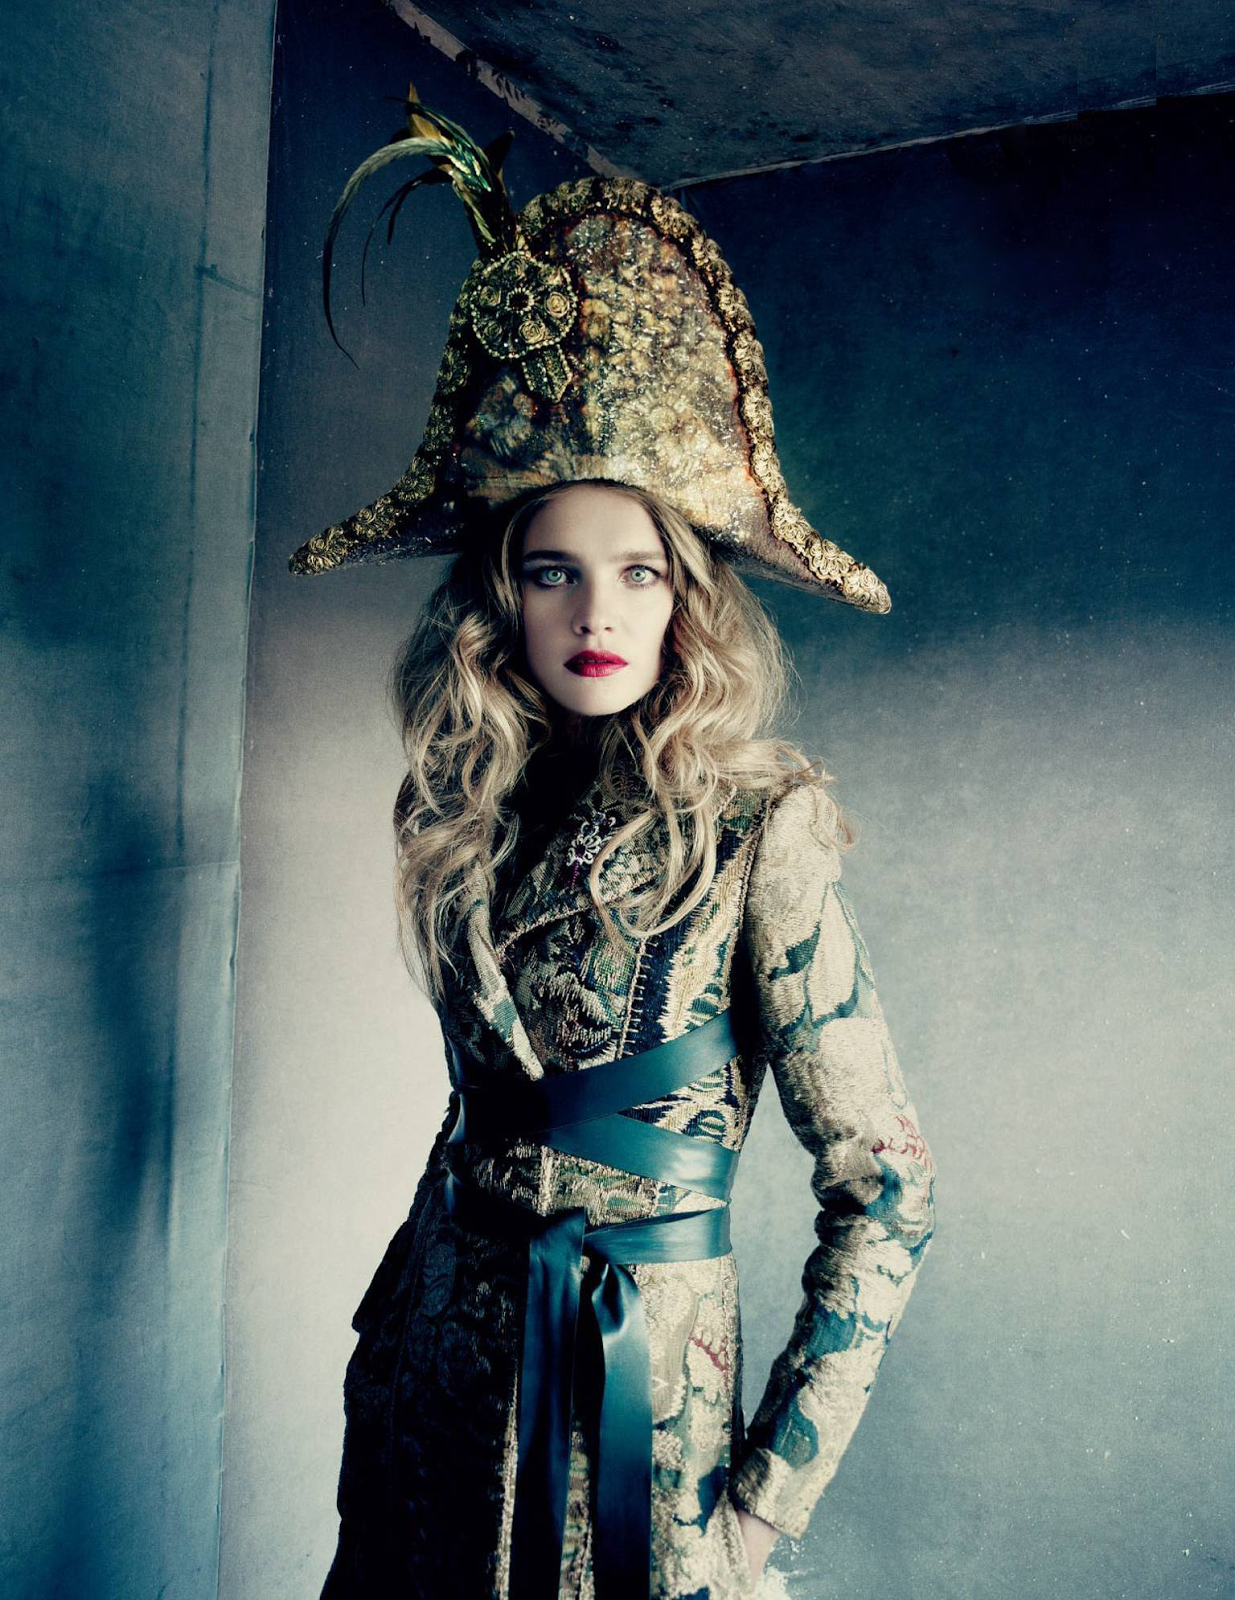 visual optimism; fashion editorials, shows, campaigns & more!: natalia vodianova by paolo roversi for vogue russia december 2014